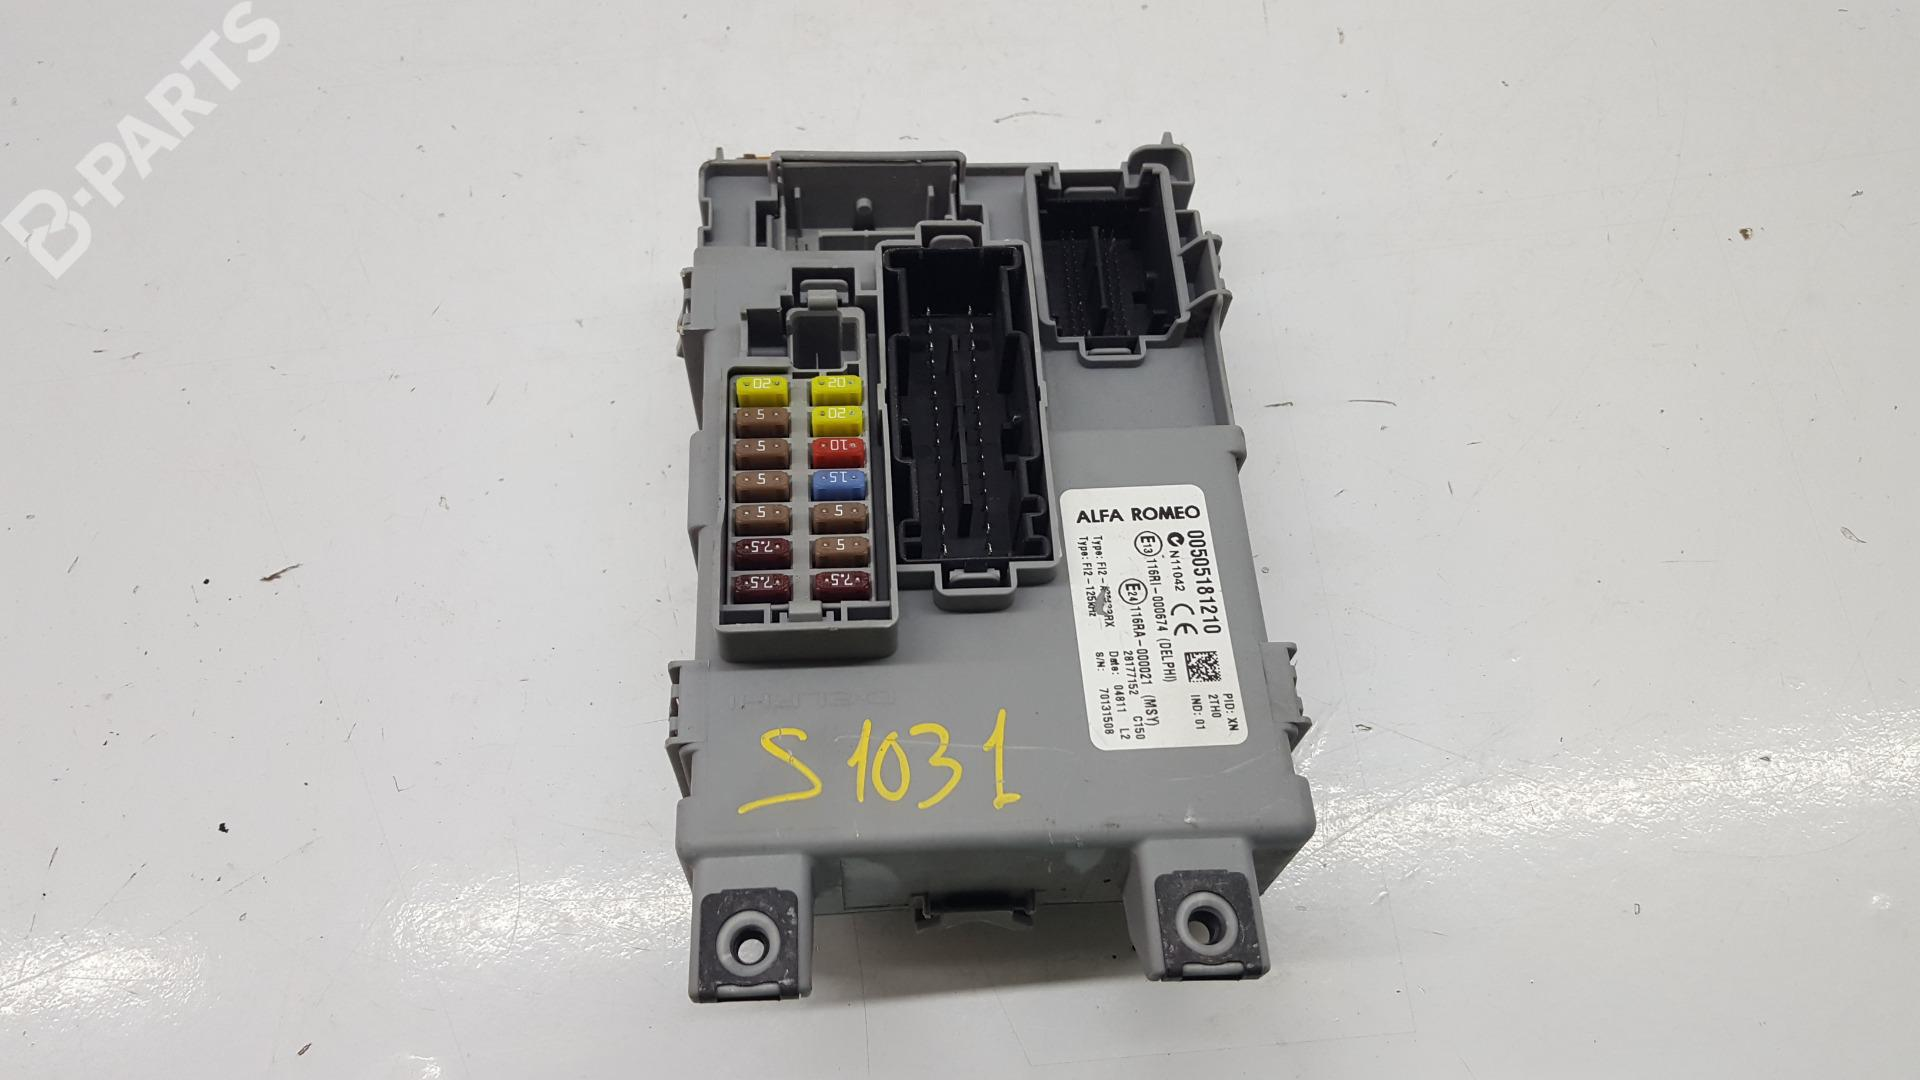 hight resolution of fuse box 00505181210 alfa romeo mito 955 1 4 955axb1b 3